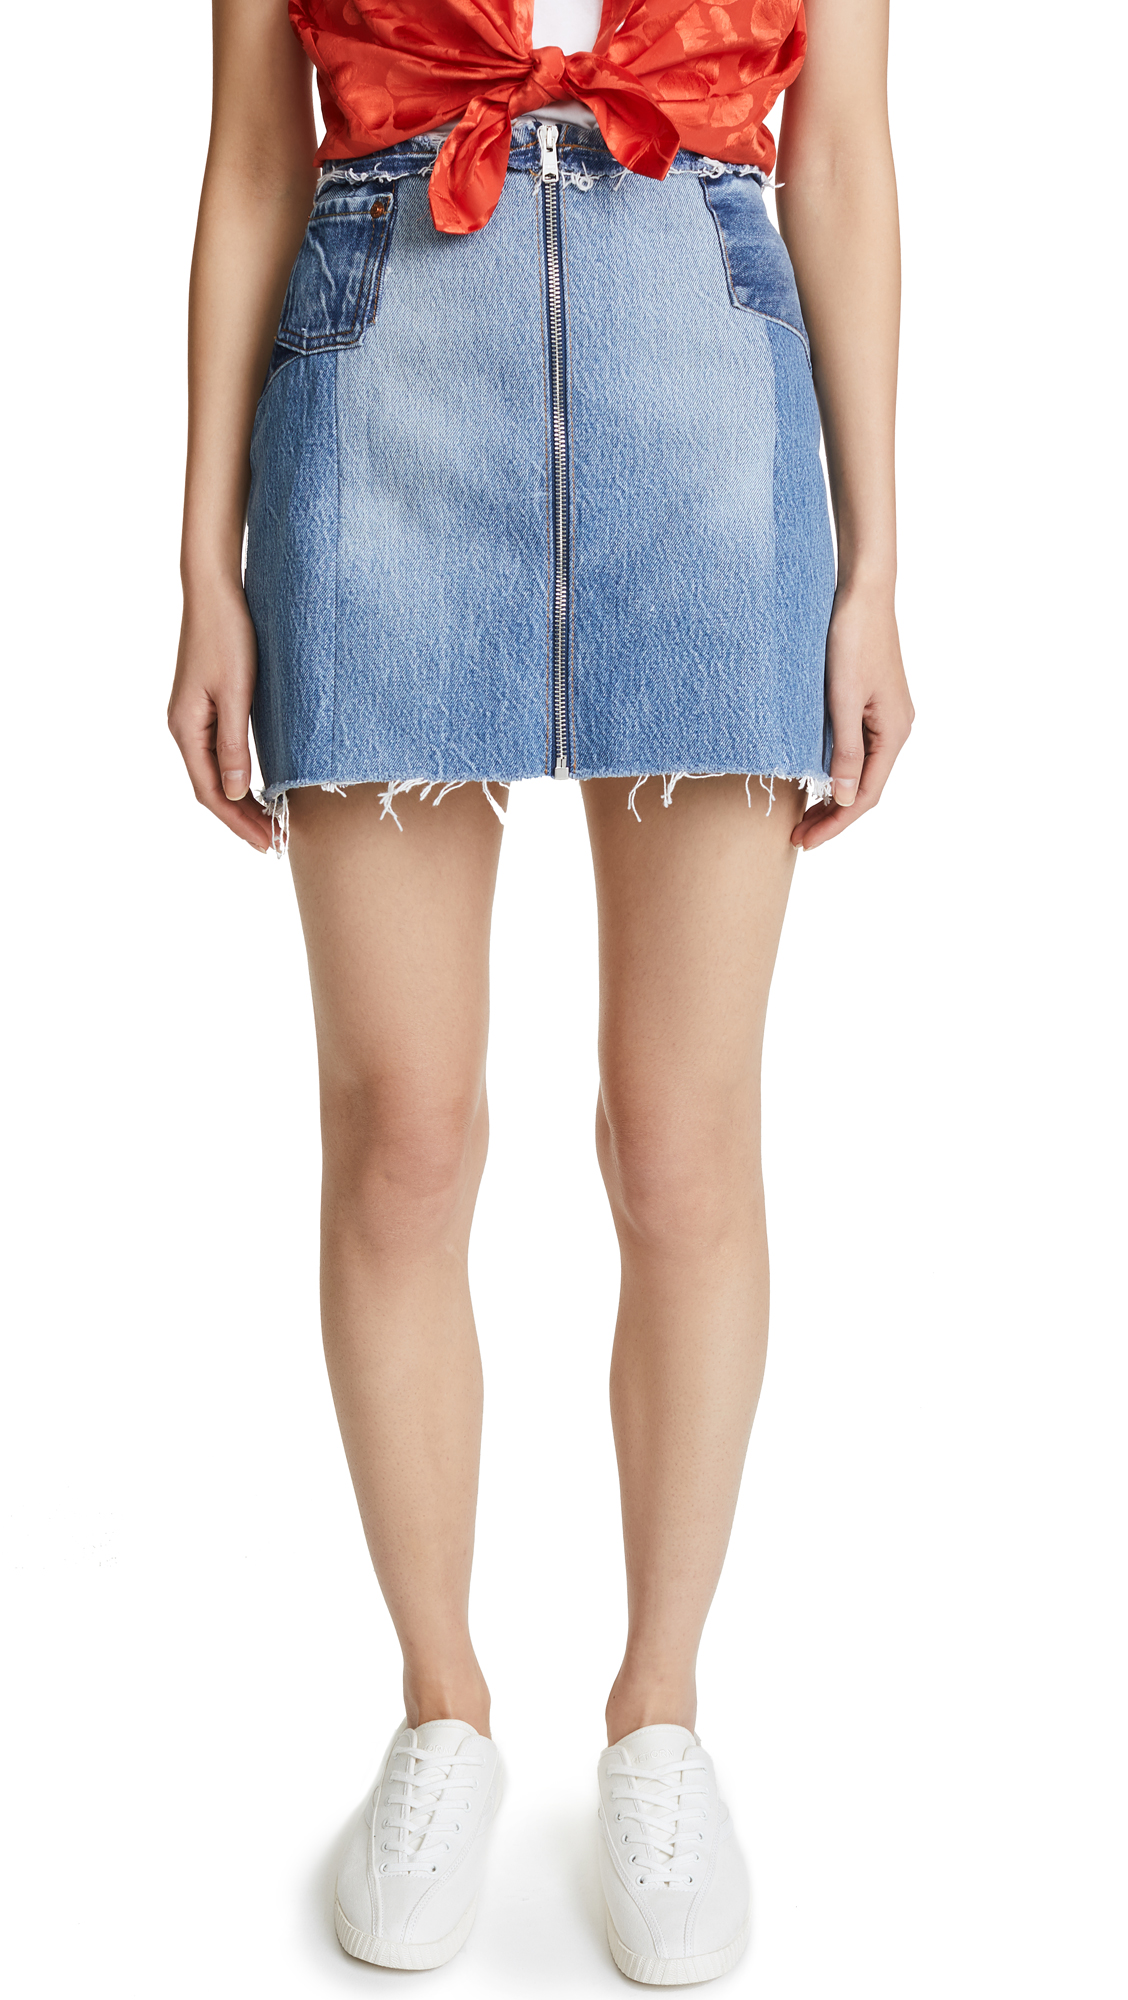 RE/DONE Raw Edge Zip Skirt In Indigo